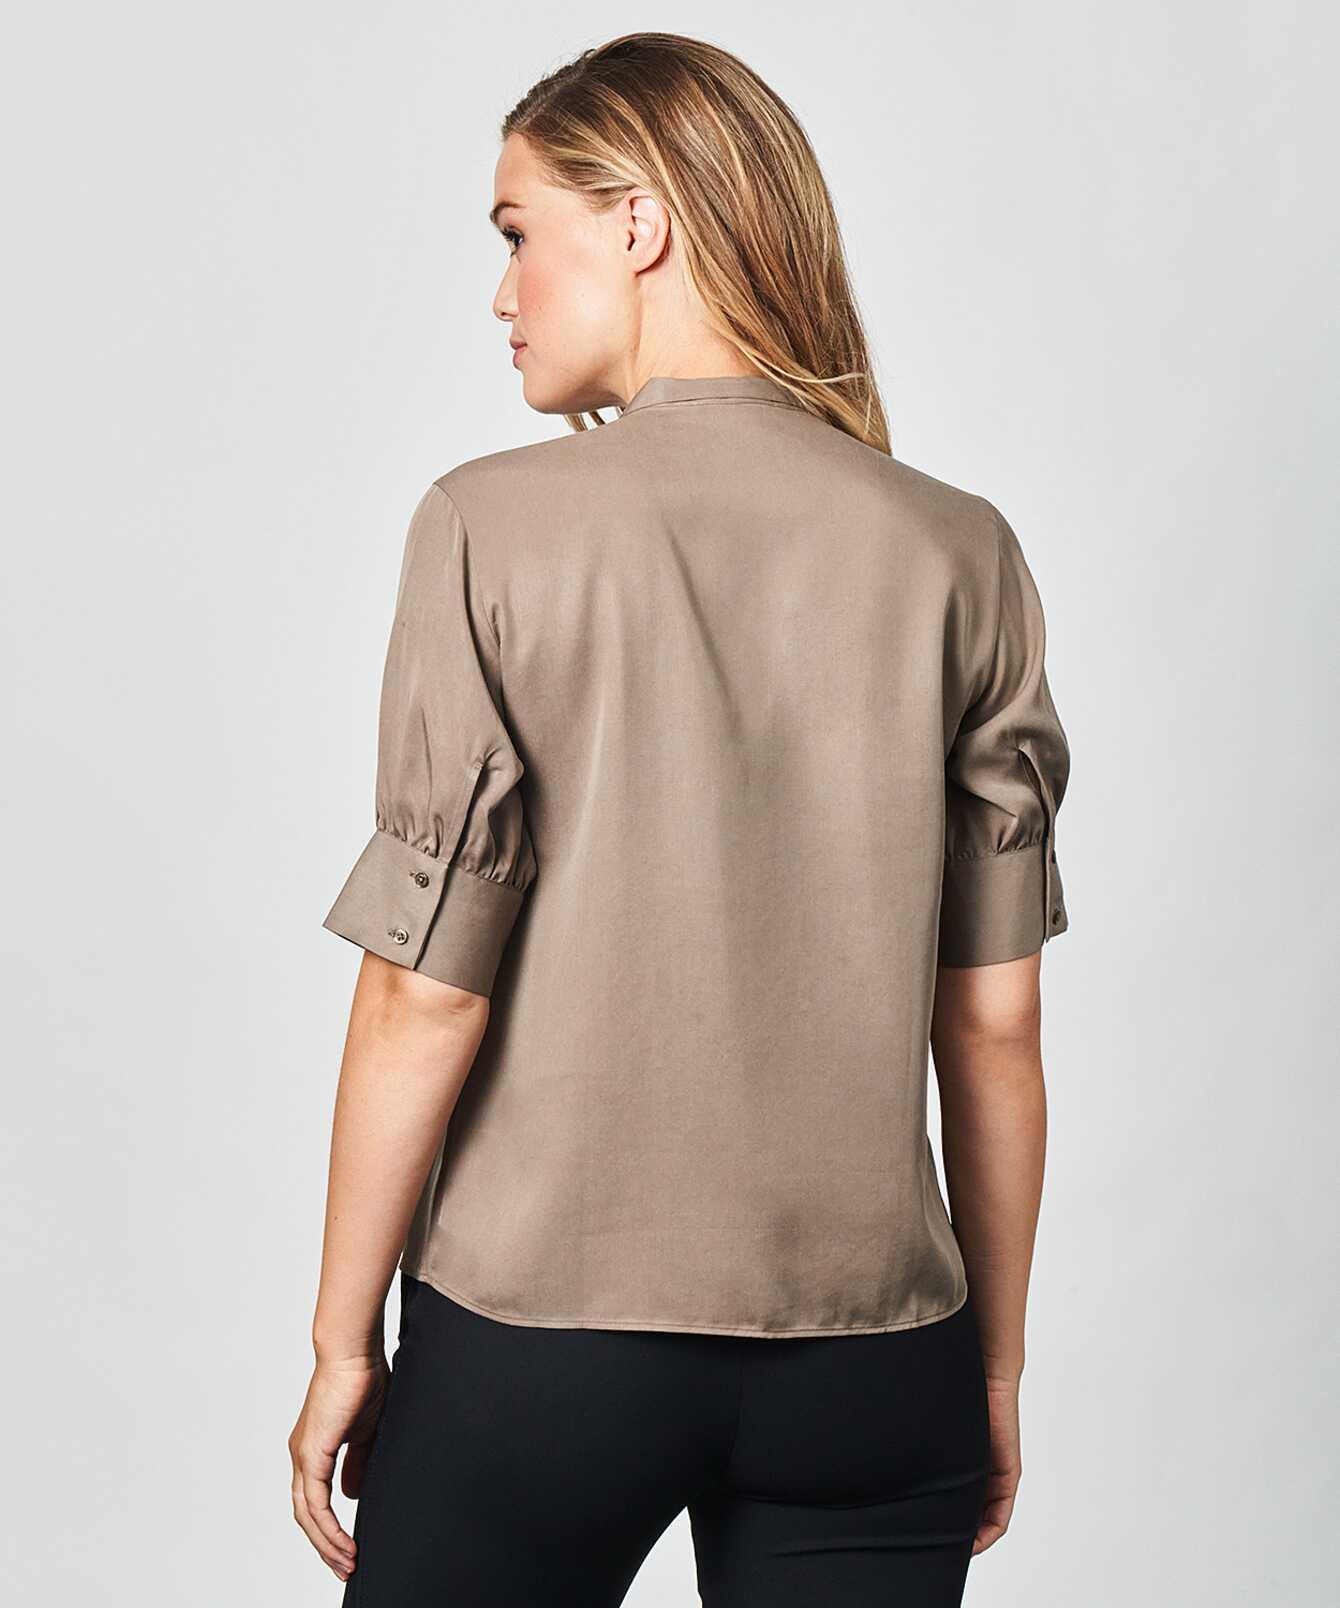 Skjorta Sanna Soft Taupe The Shirt Factory